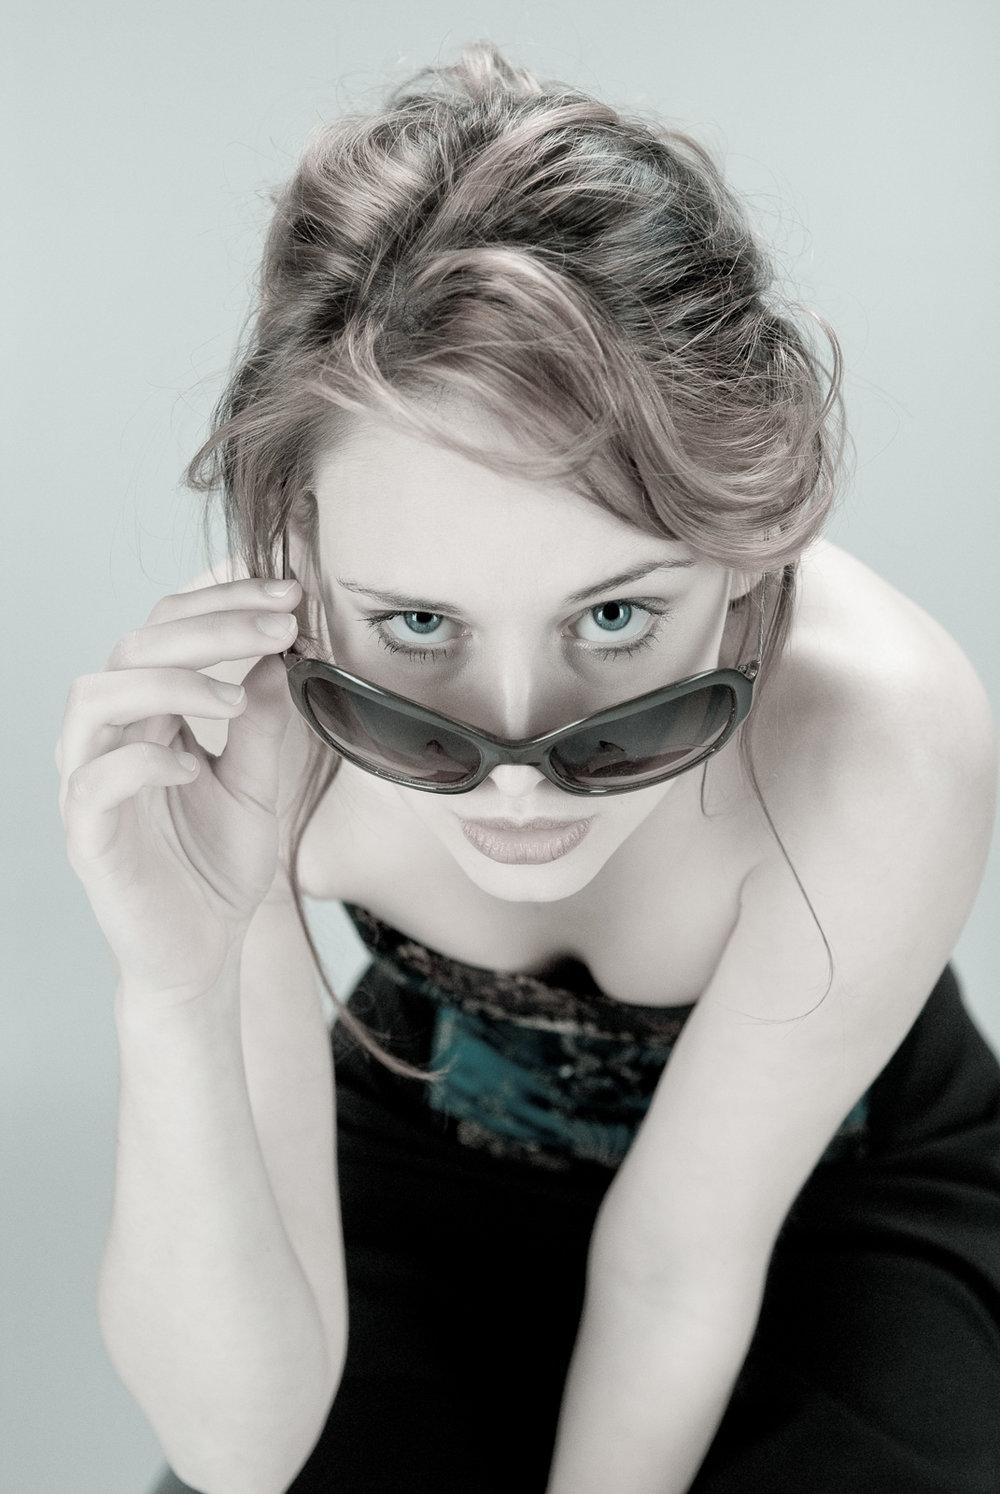 Bernard_Panier-FashionLike-004.jpg